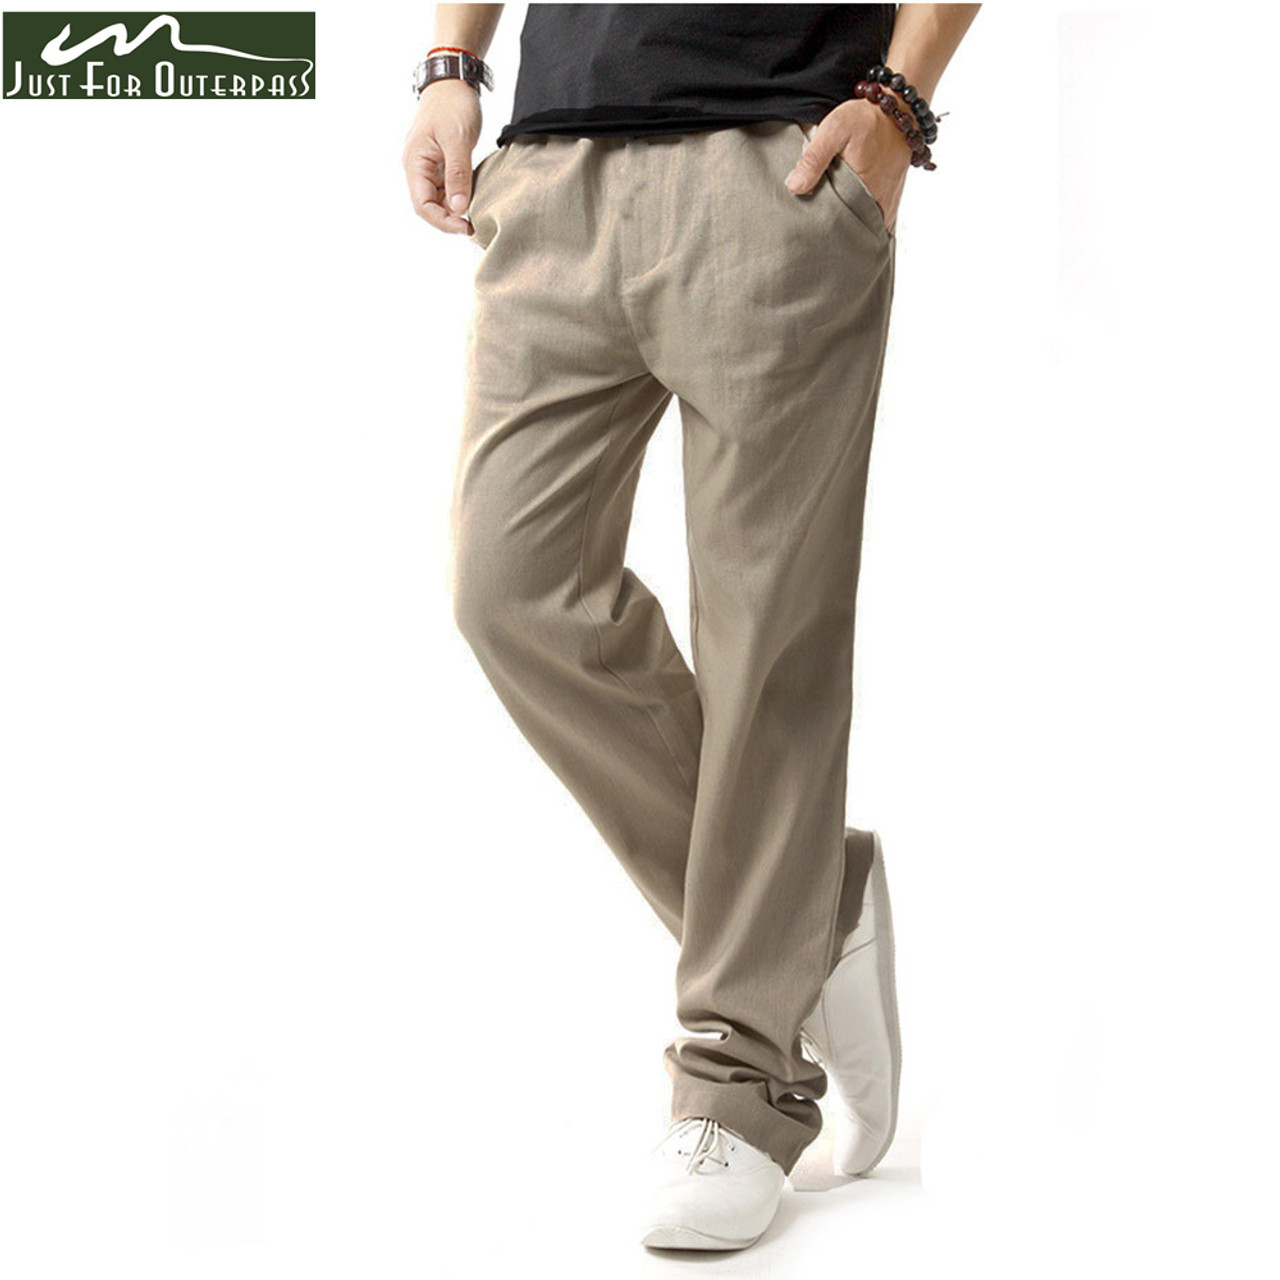 7f156d17481 ... 2018 New Arrival Fashion Summer Linen Pants Men Breathable Casual Pants  Comfort Mens Big Size Flax ...